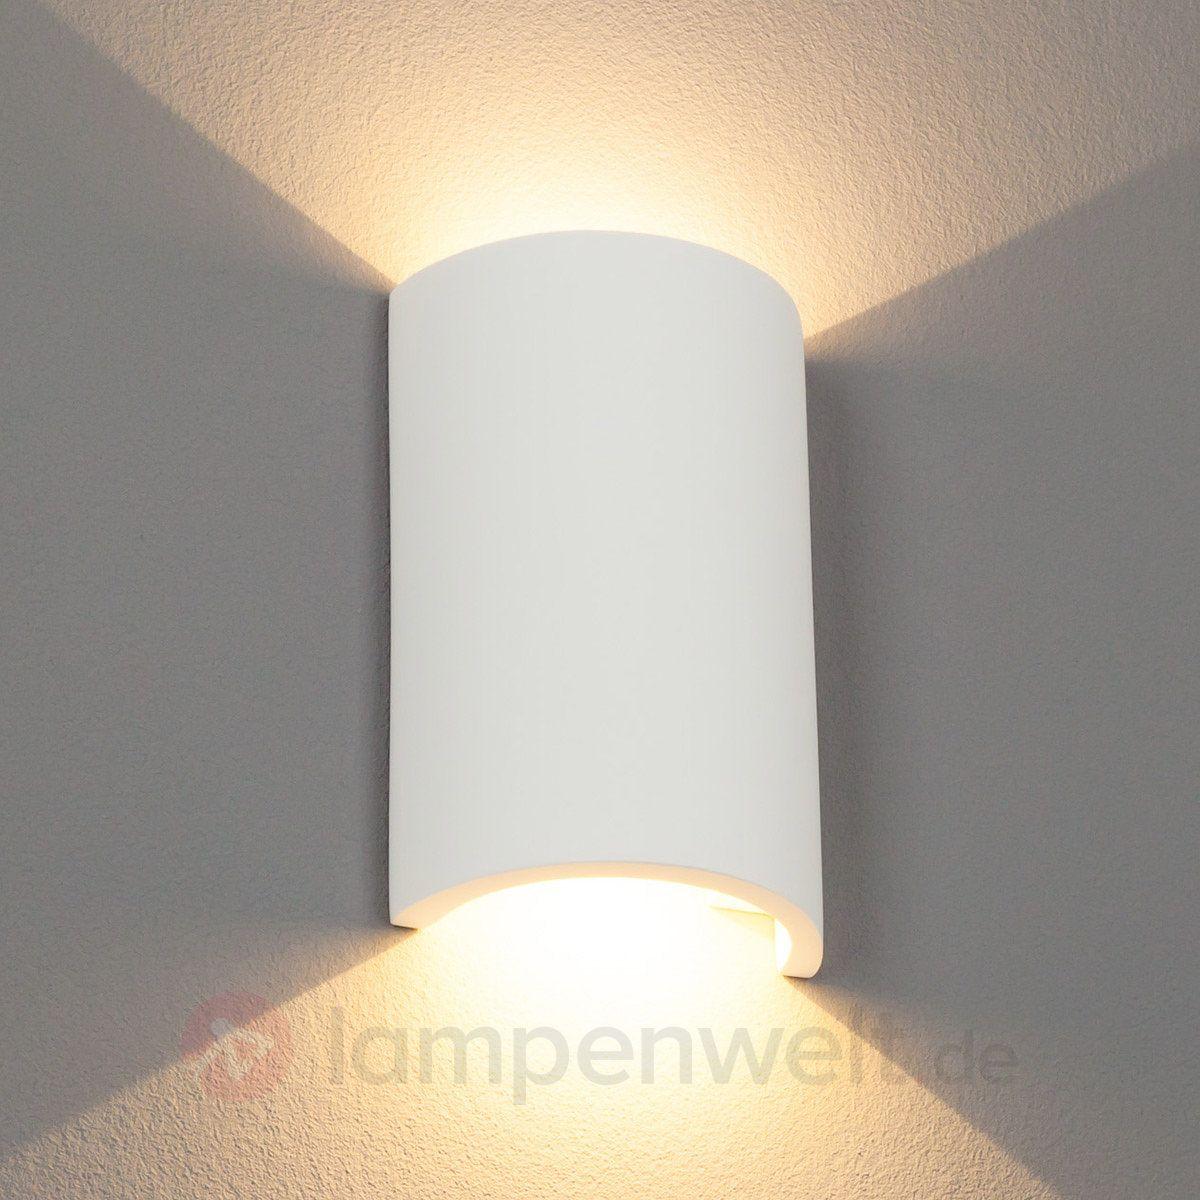 halbrunde led-gips-wandlampe gideon sicher & bequem online bestellen